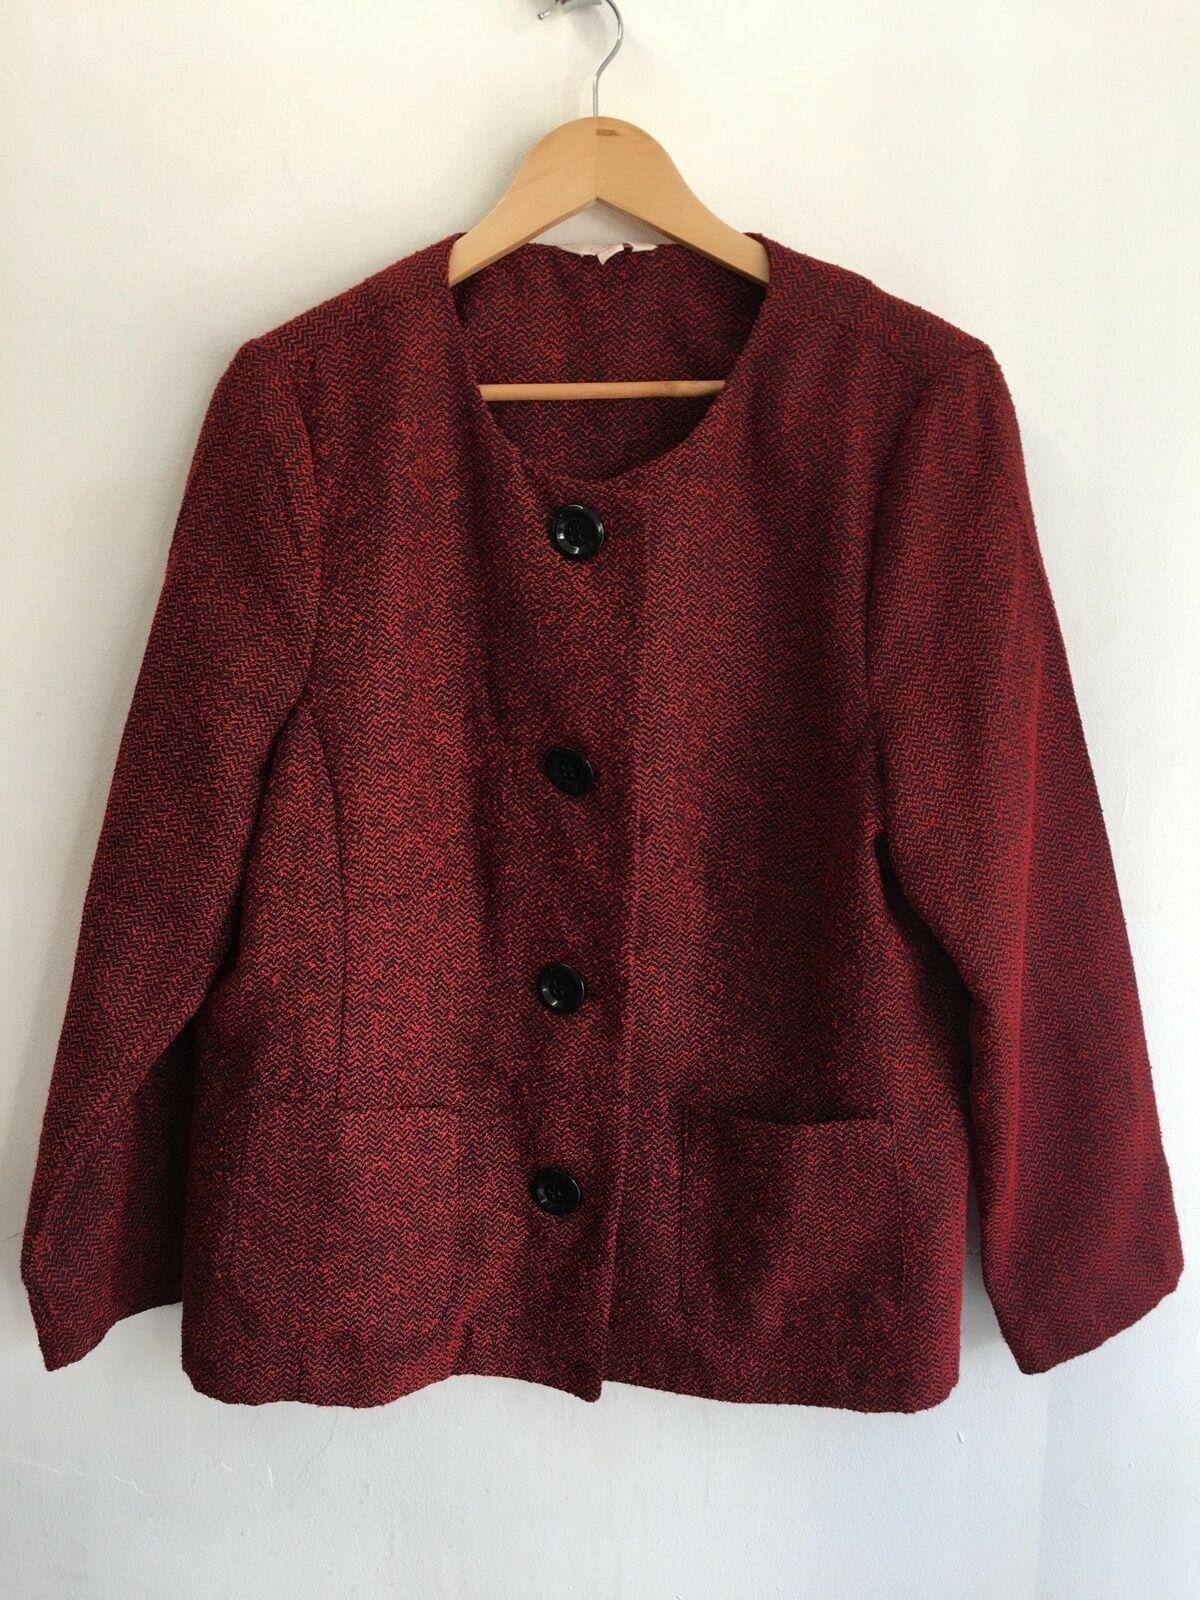 Womens Crew Neck Red Mix Big Button Blazer Jacket by JULIPA - Size 18